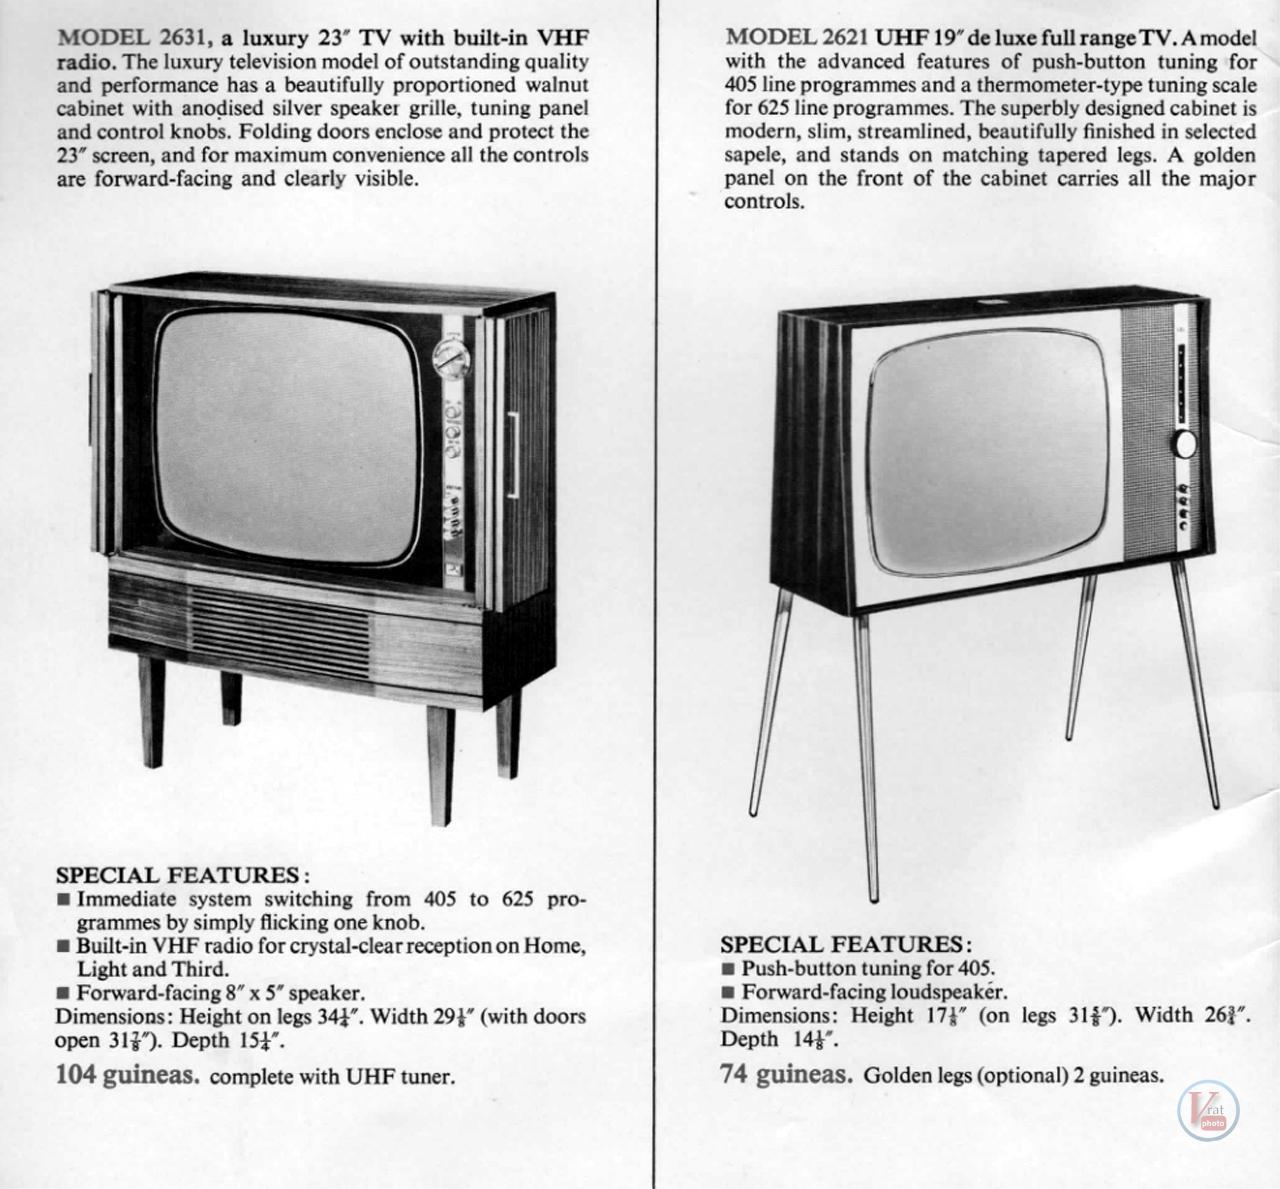 HMV B&W TV's 71